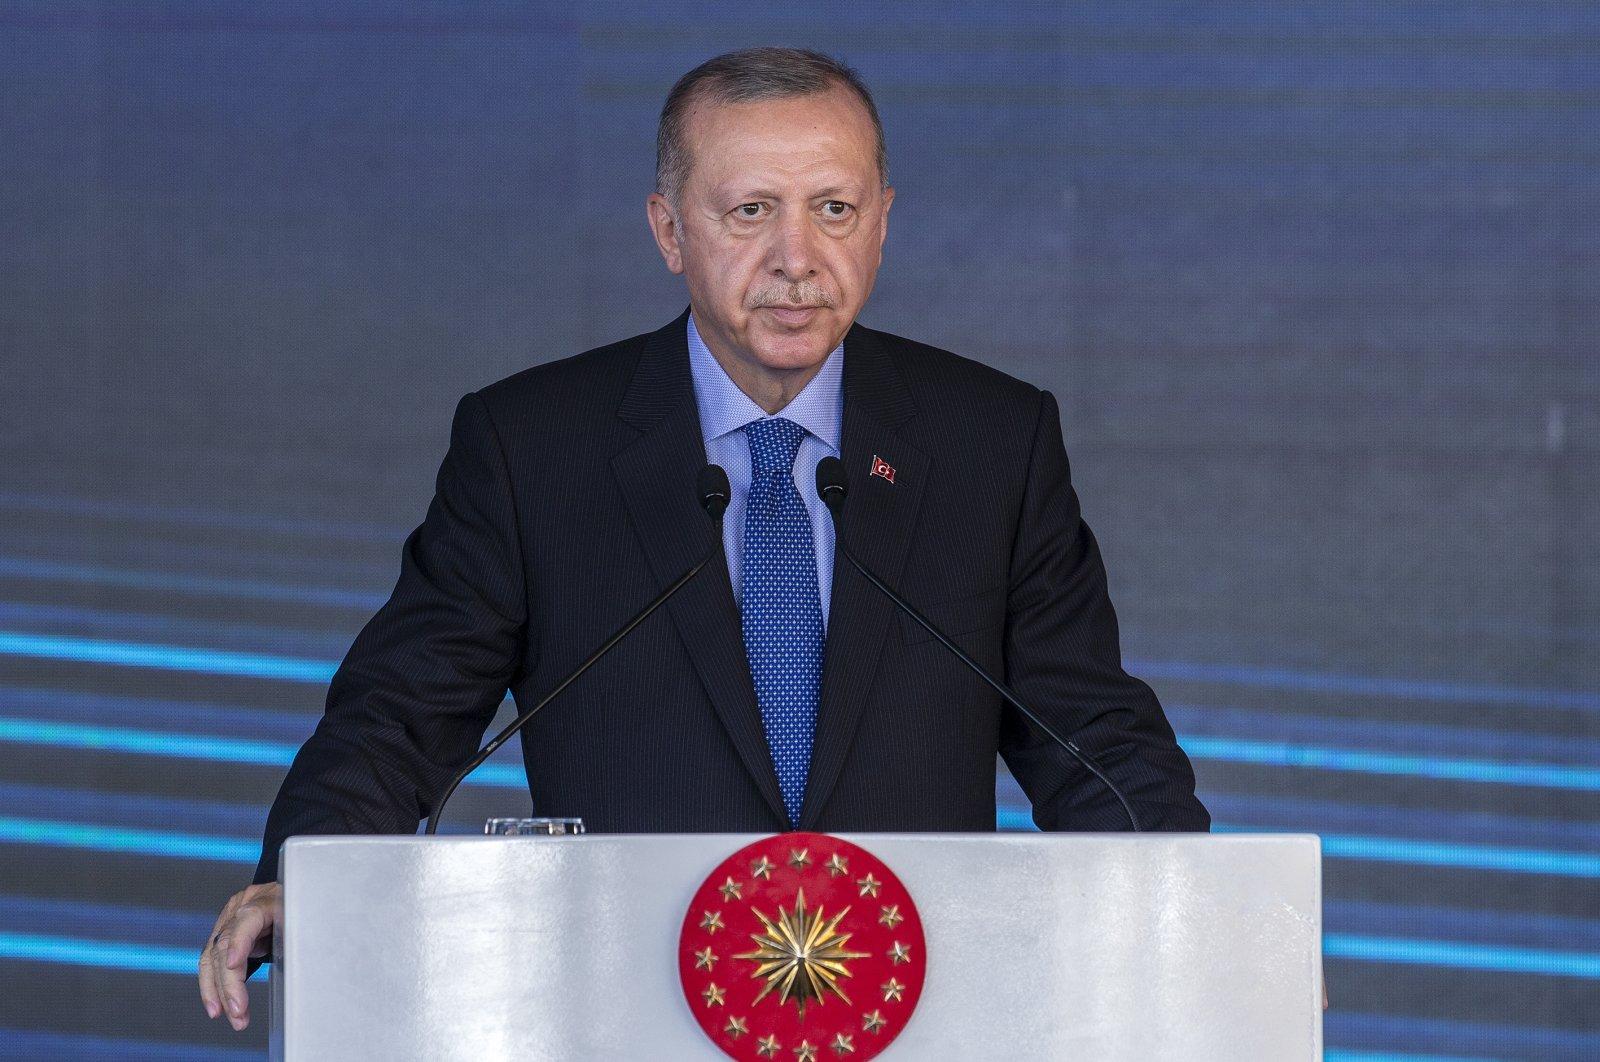 President Recep Tayyip Erdoğan speaks at the opening ceremony of Turkey's first solar panel factory in Ankara, Turkey, Aug. 19, 2020. (AA Photo)